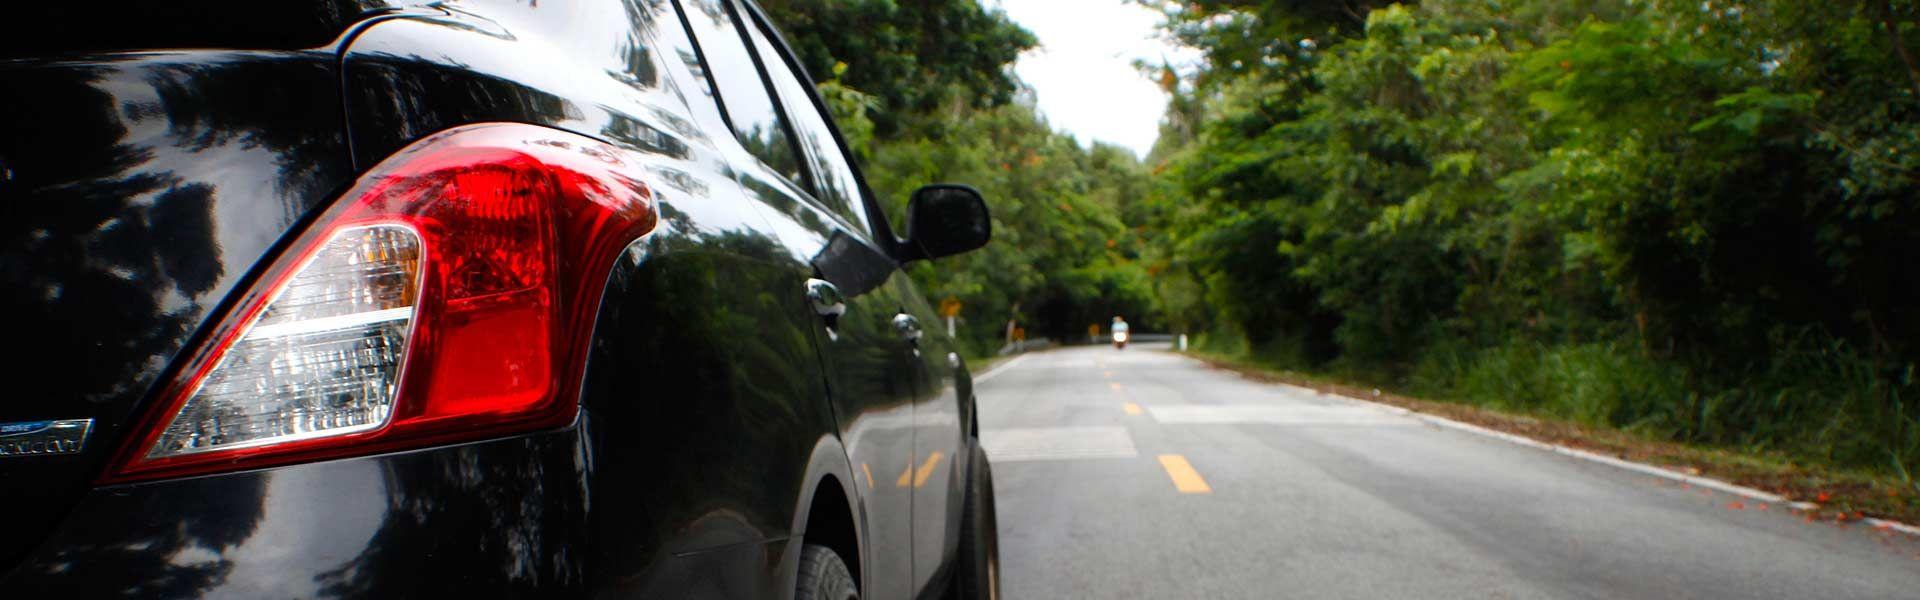 Auto Insurance Plans Kitchener Auto Insurance E Bollenbach